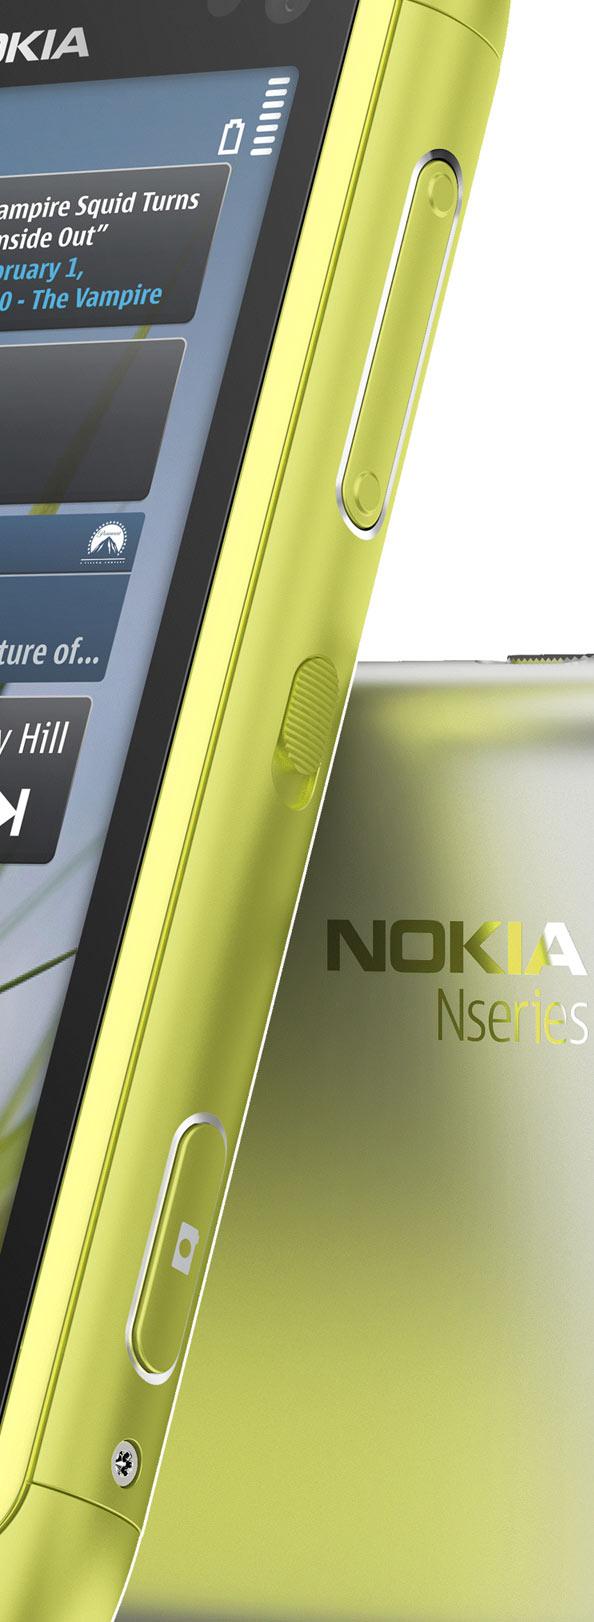 Nokia-n8-connectique-3